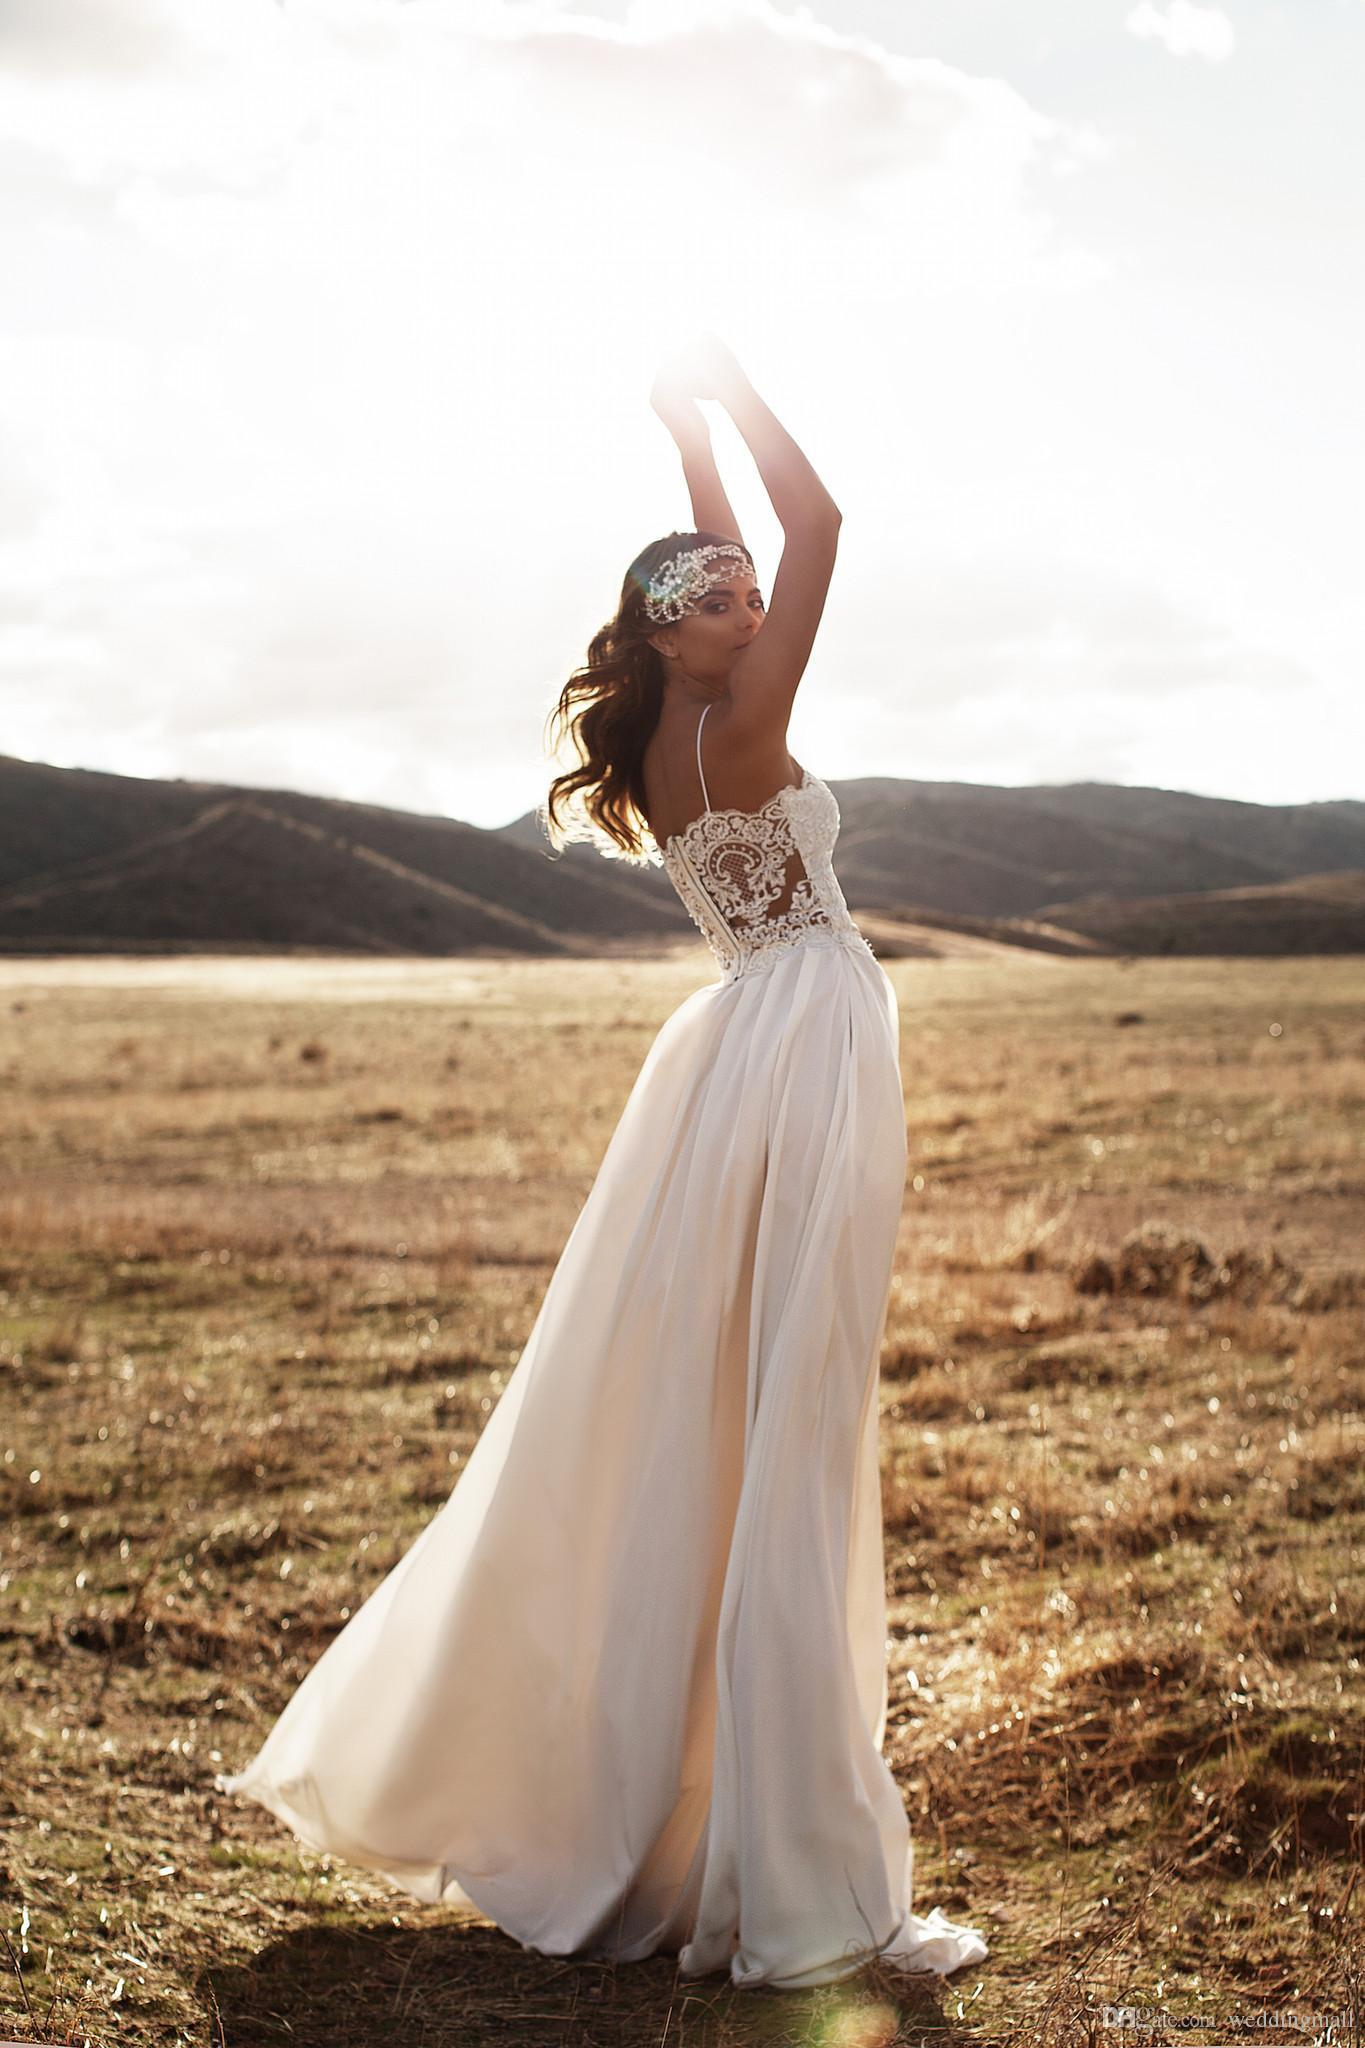 2020 New Vintage Lace Beach Wedding Dresses Spaghetti A-line Chiffon Floor Length Bridal Dresses Simple Cheap Wedding Gowns 2018